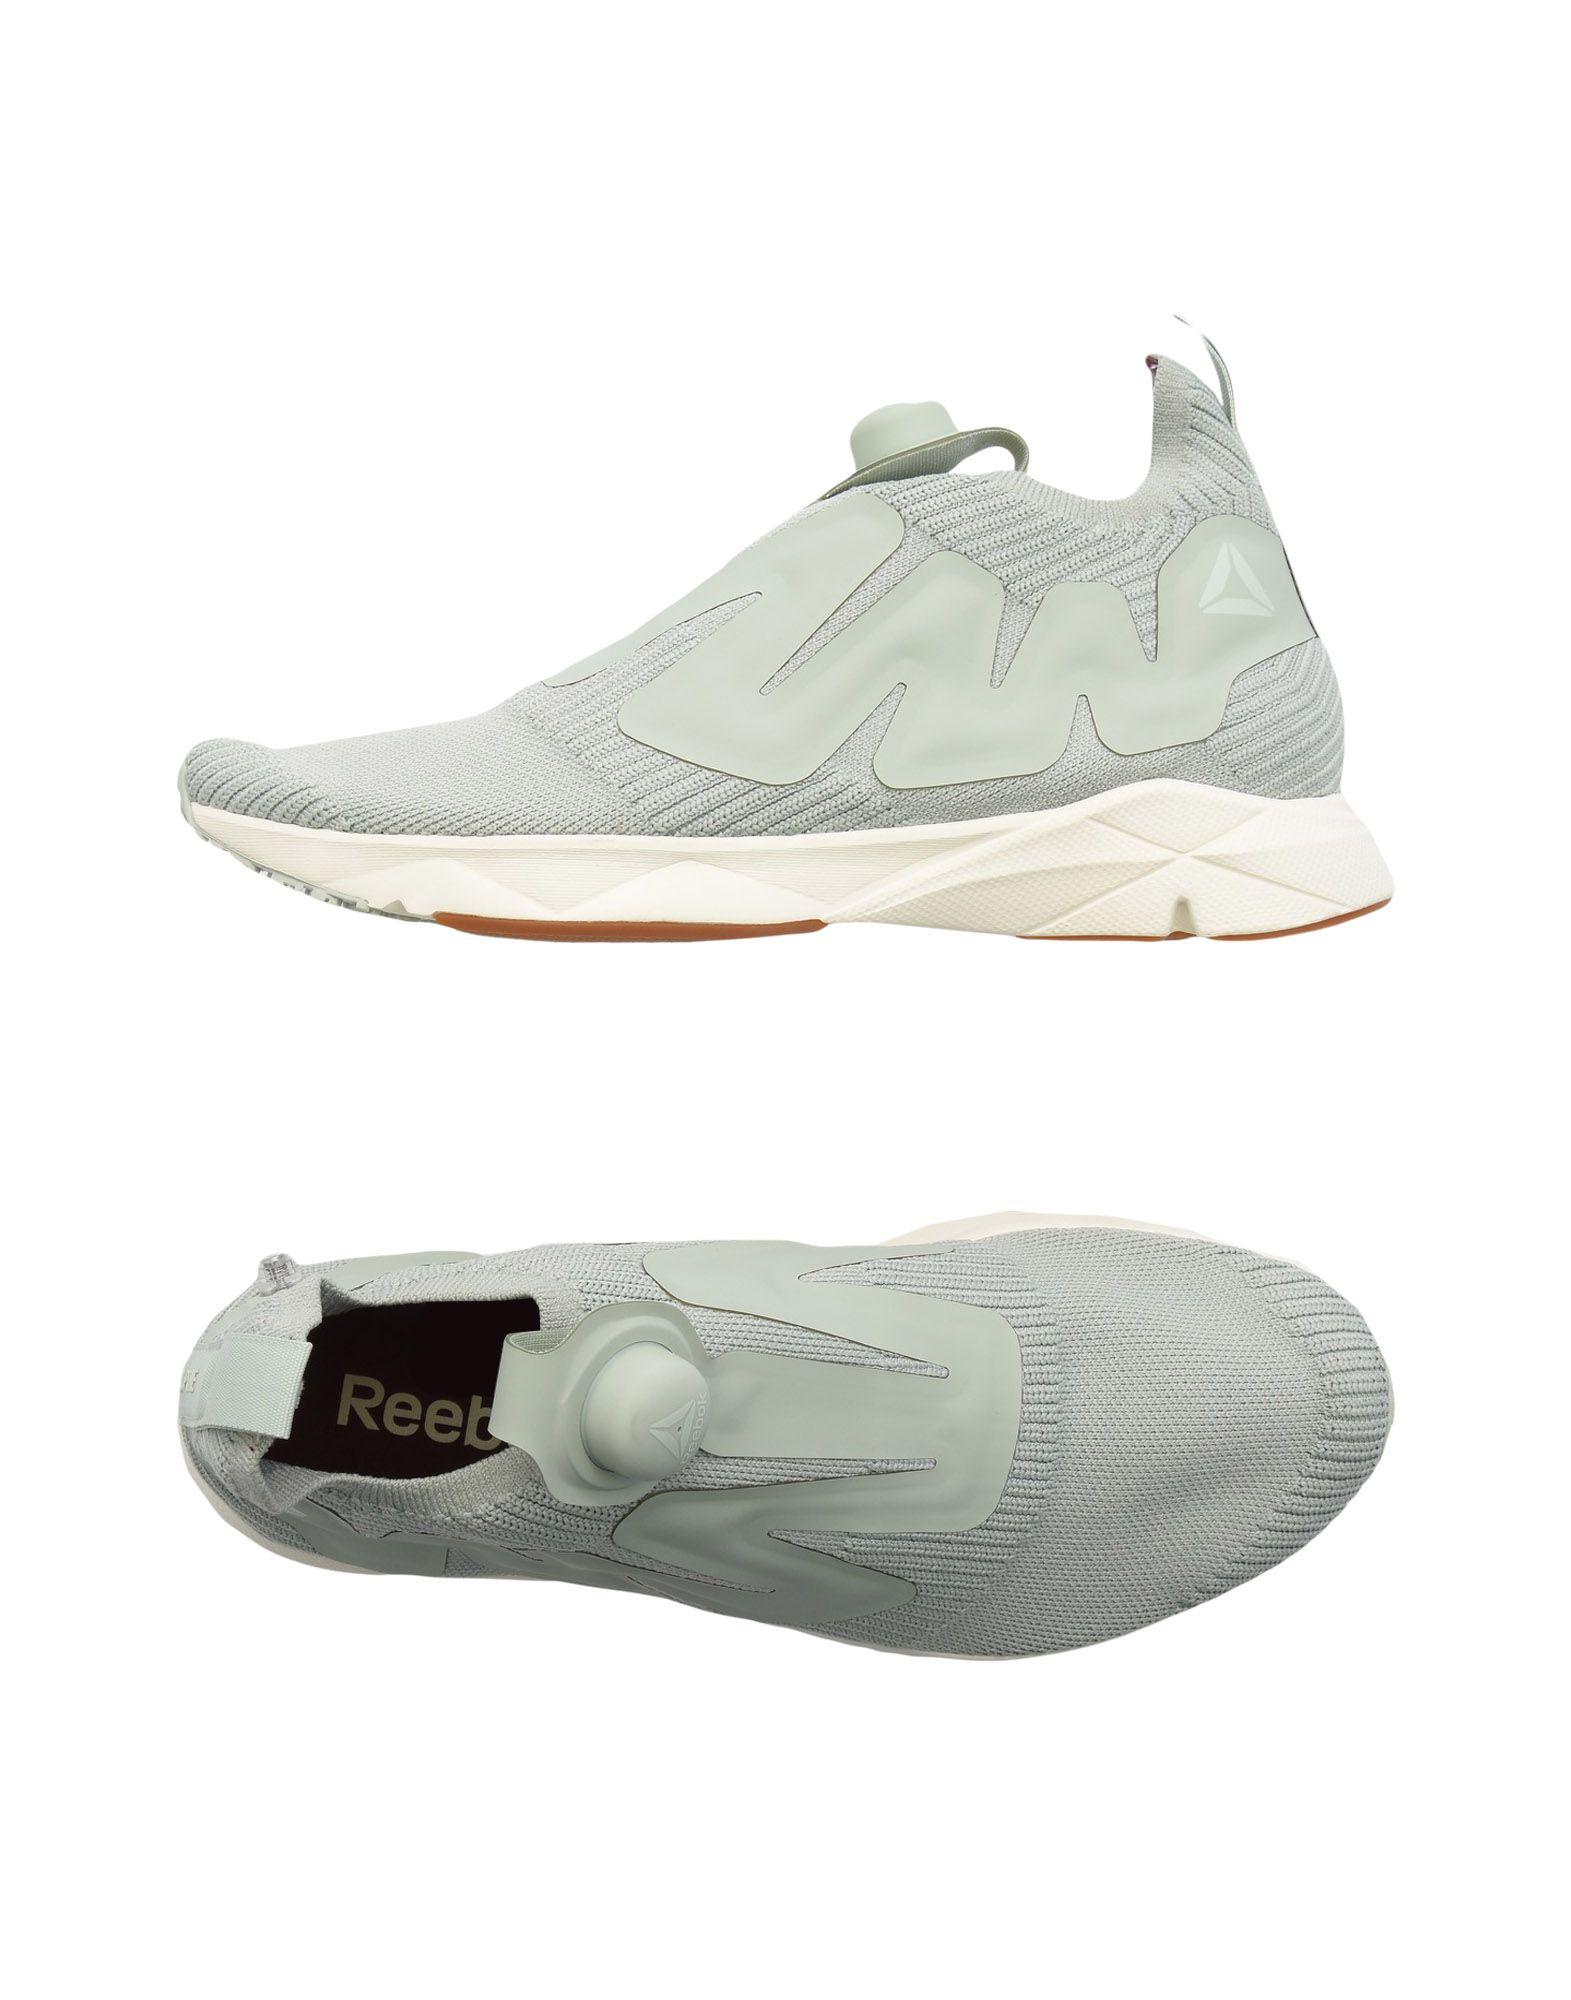 Sneakers Reebok Pump Supreme Style - Donna - 11458300FS